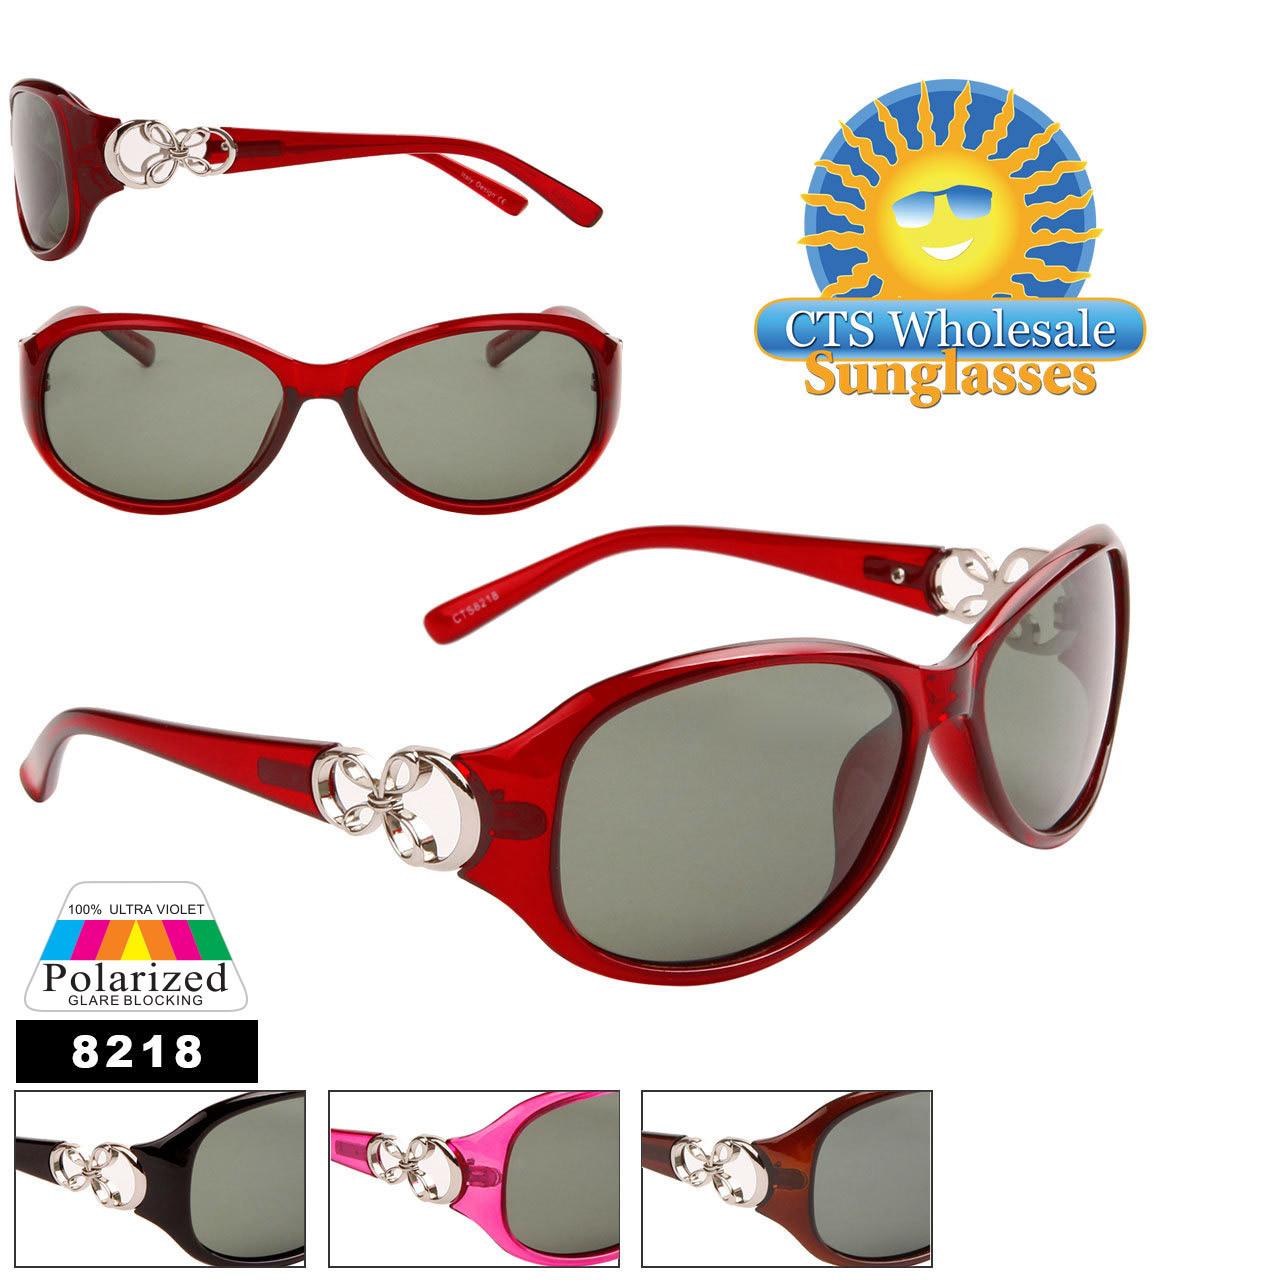 Women's Polarized Sunglasses - 8218